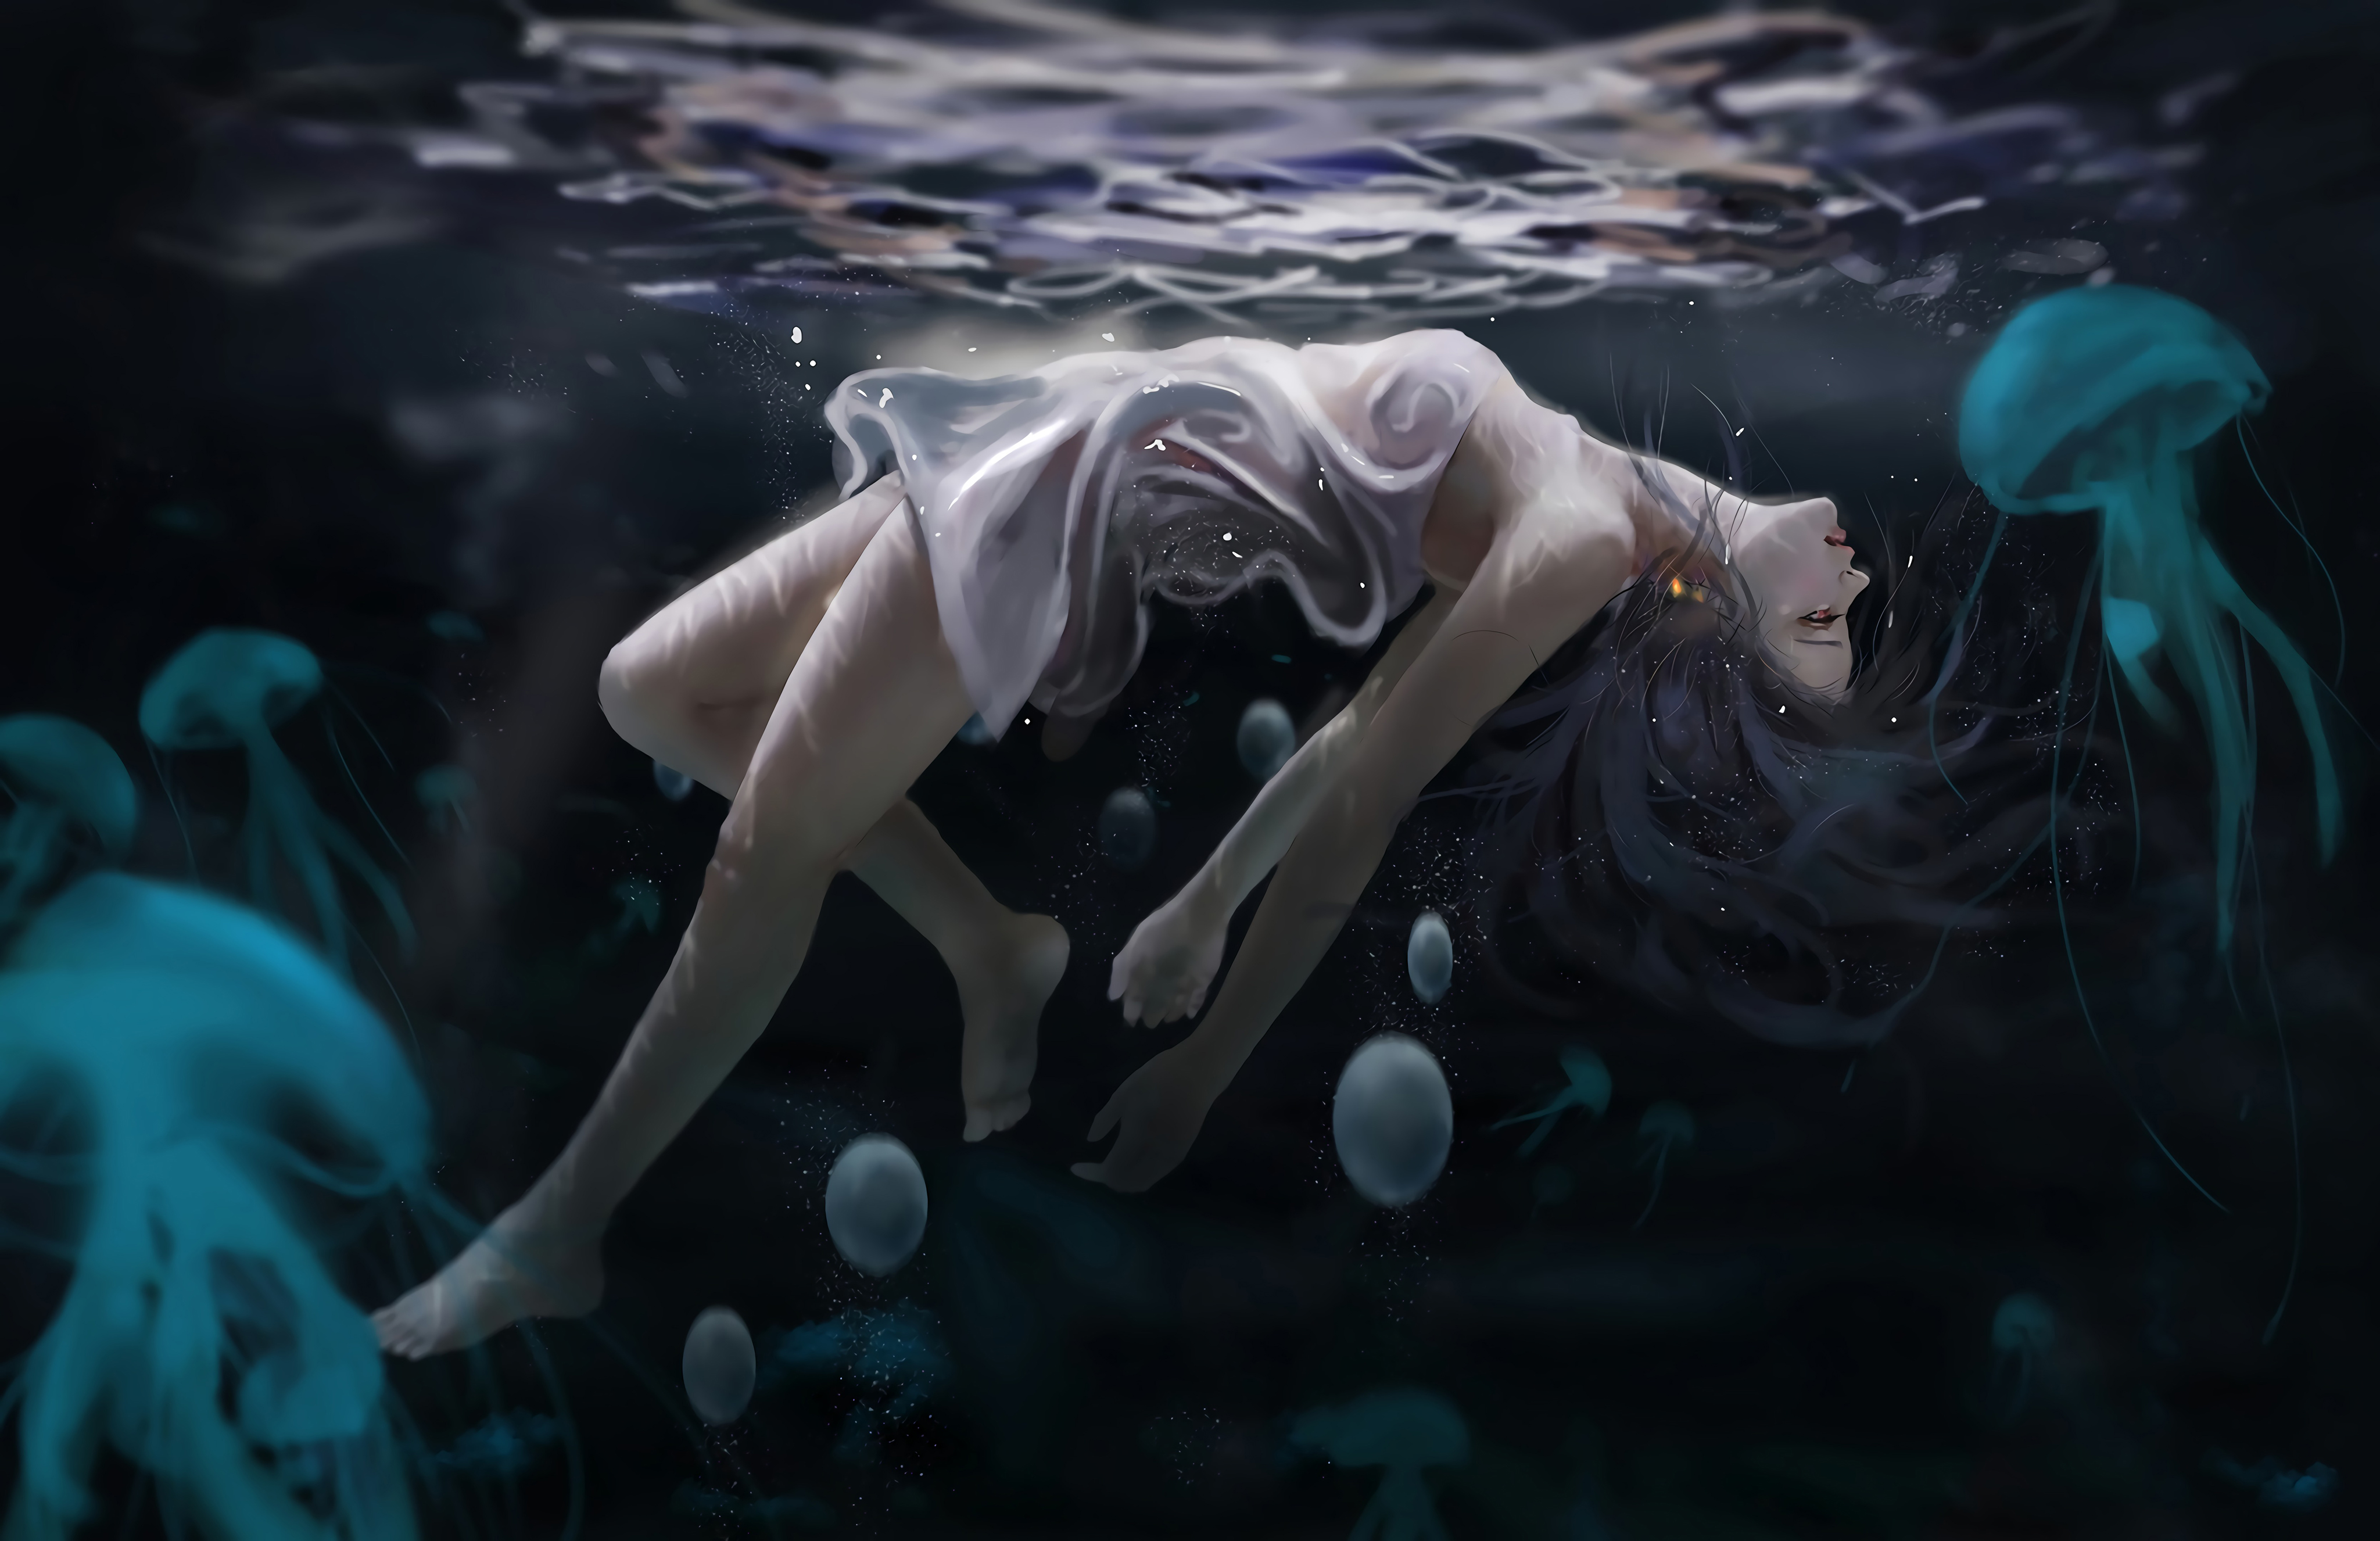 General 4096x2652 digital art jellyfish underwater in water